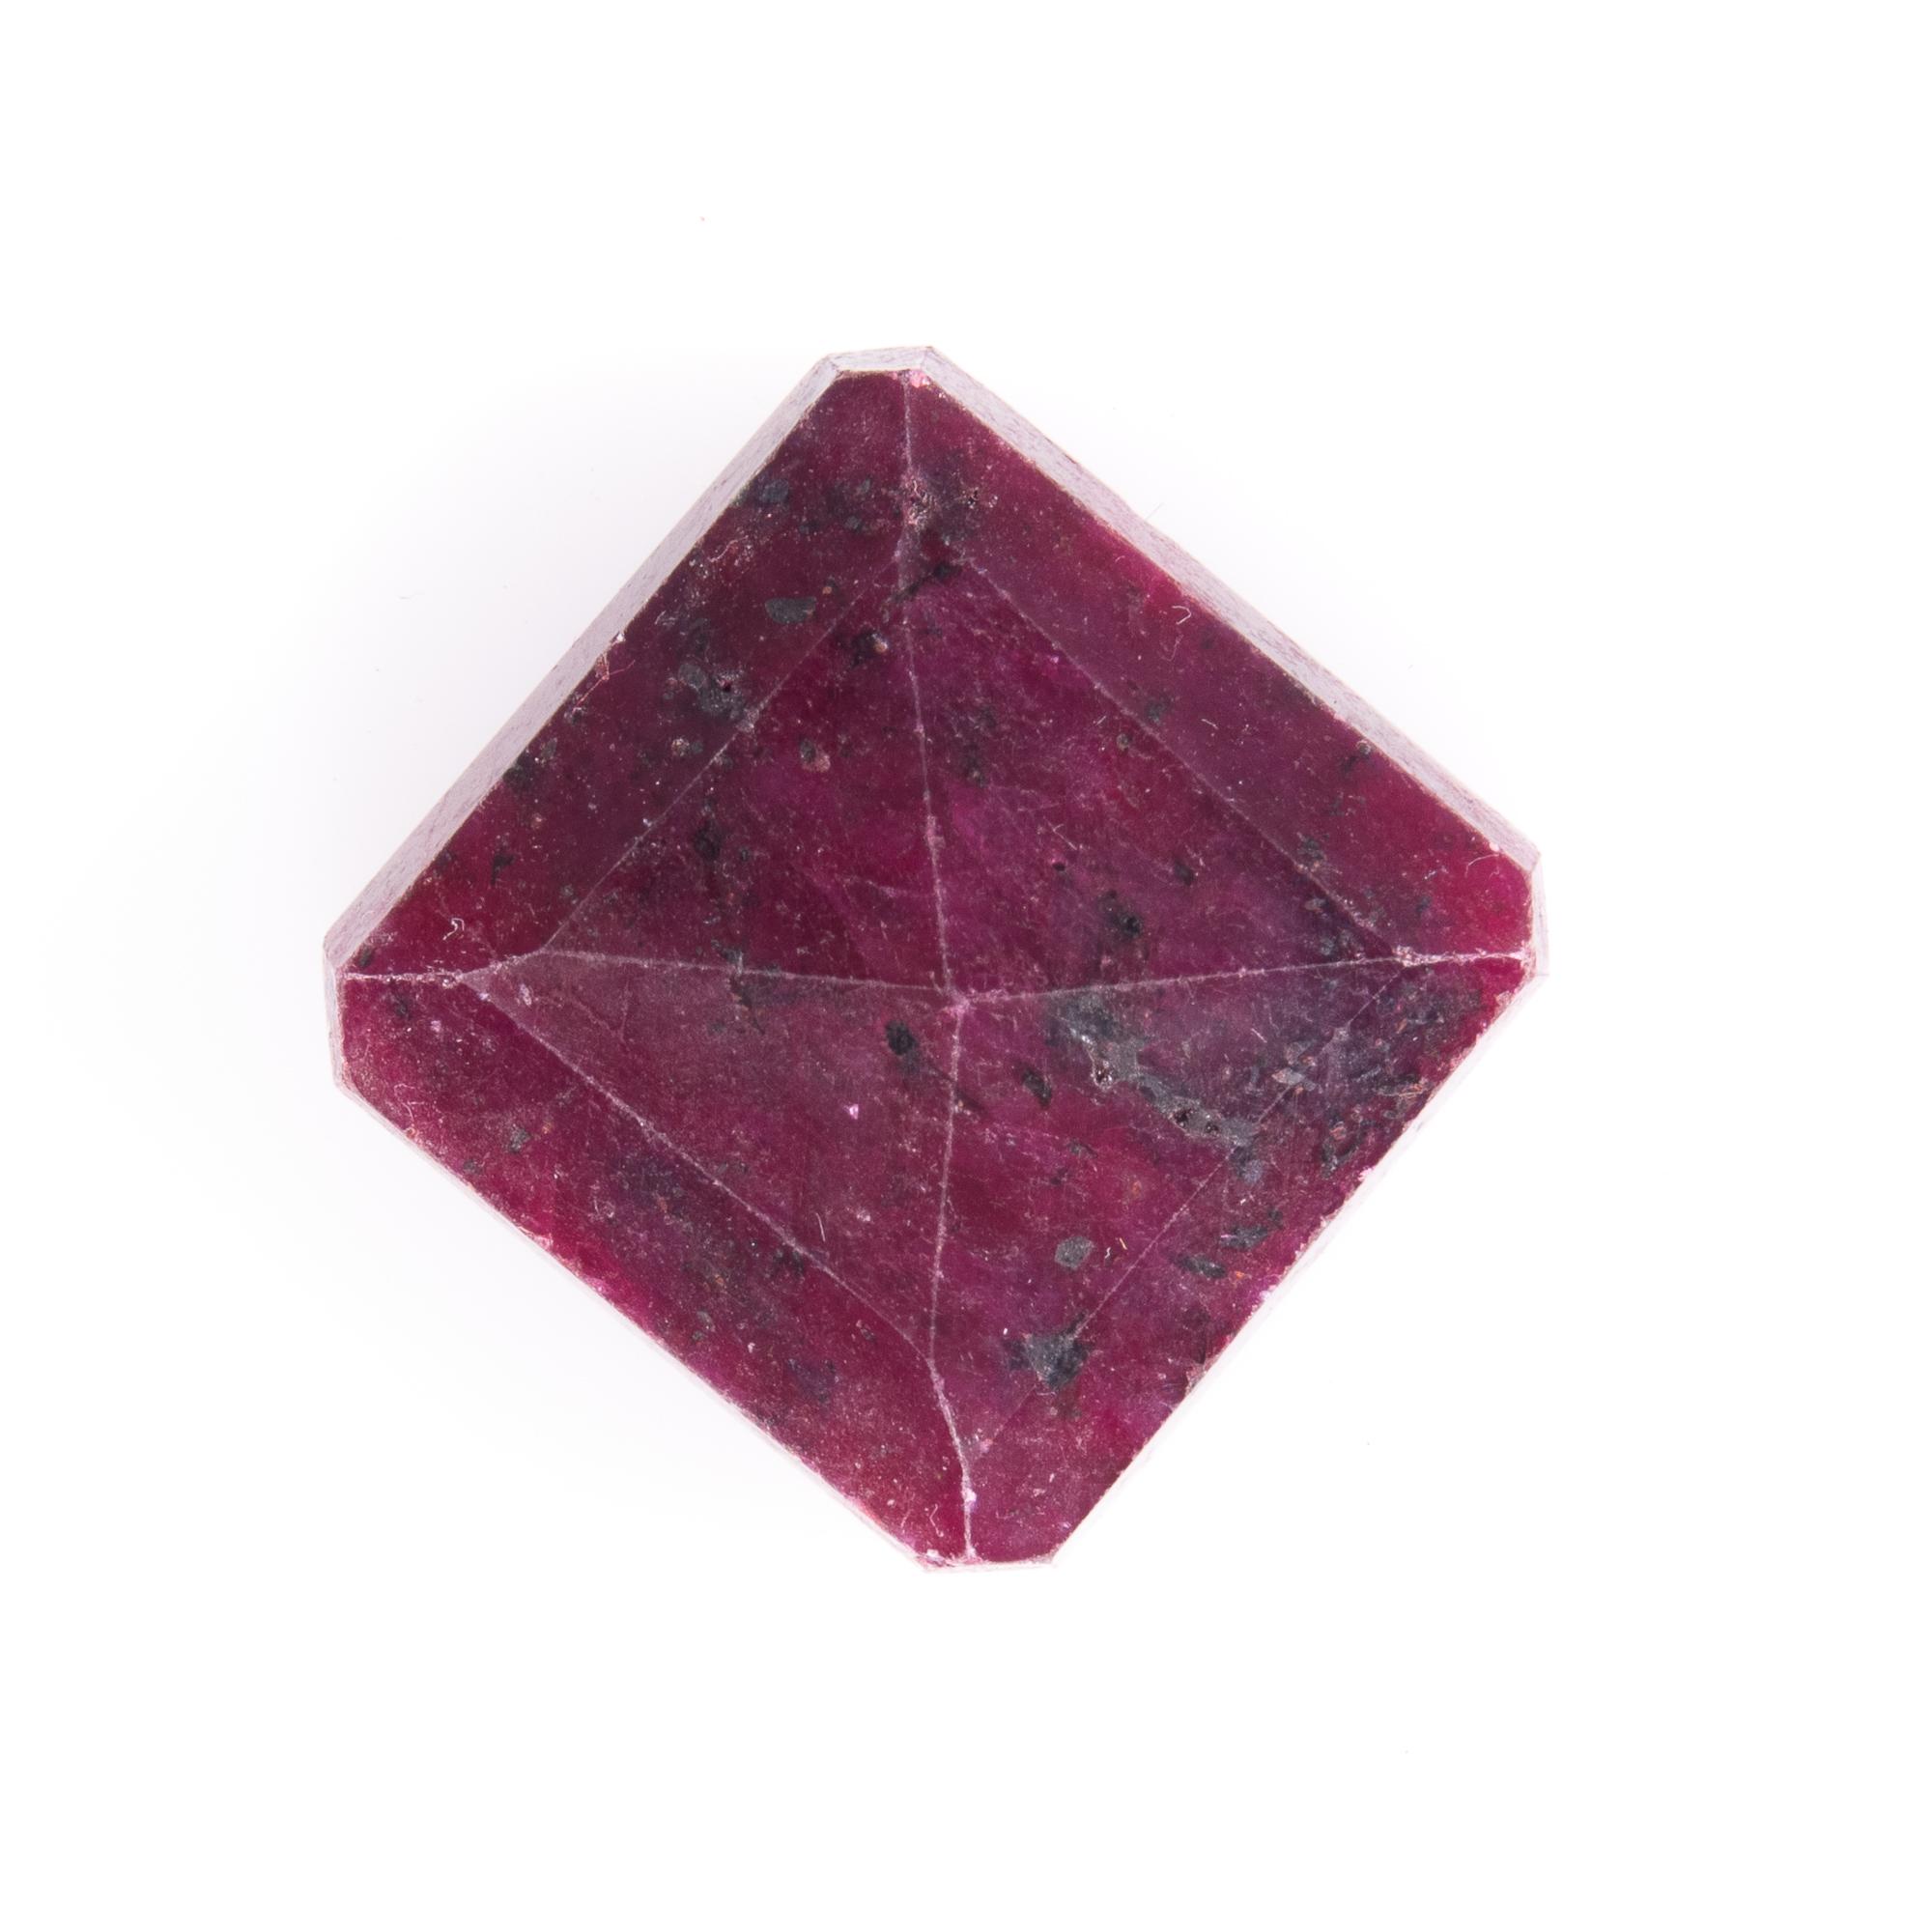 127ct Ruby Gemstone - Image 2 of 7